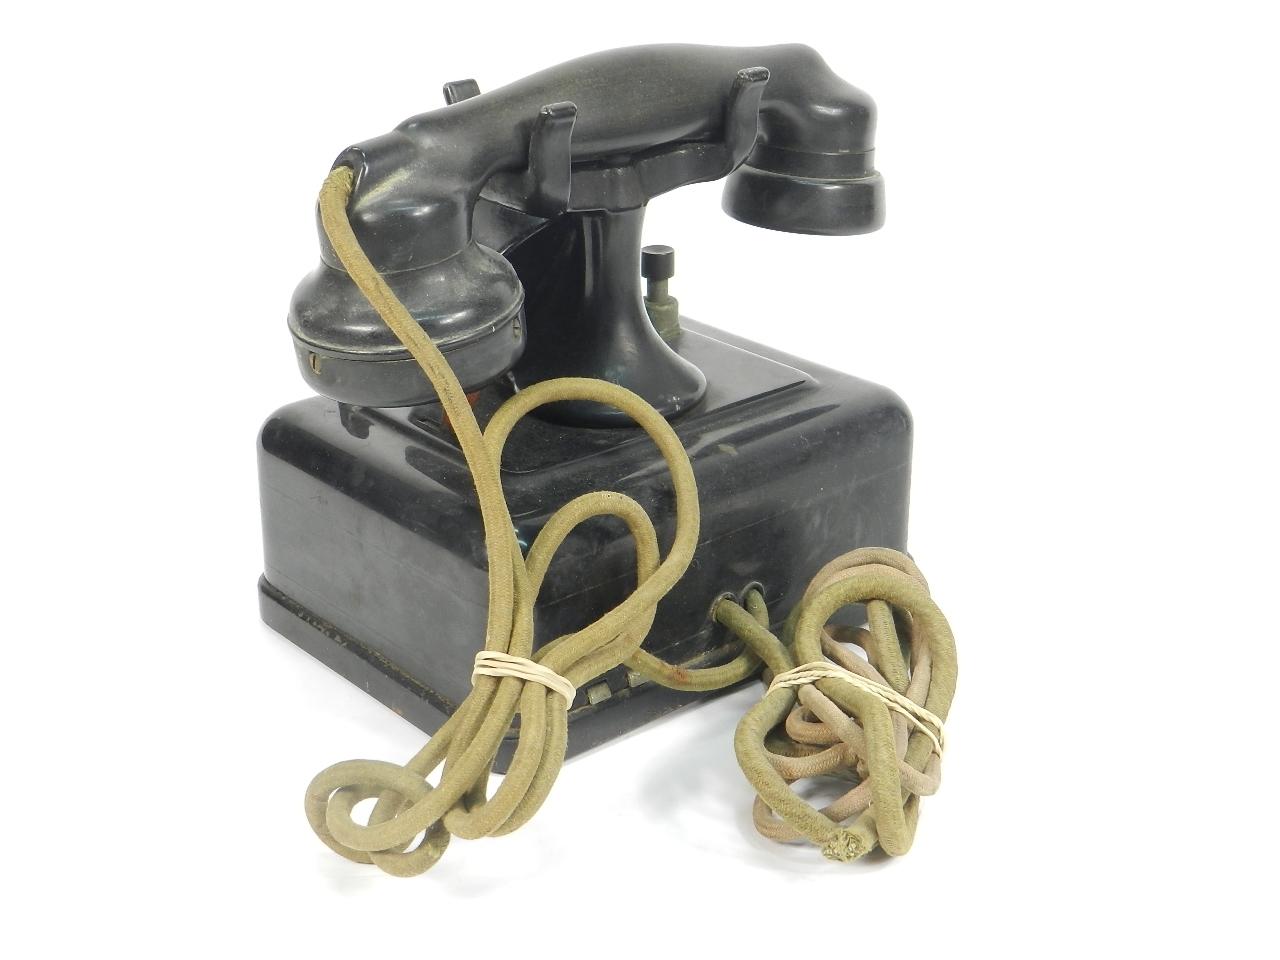 Imagen TELEFONO THOMSON HOUSTON AÑO 1930 41511